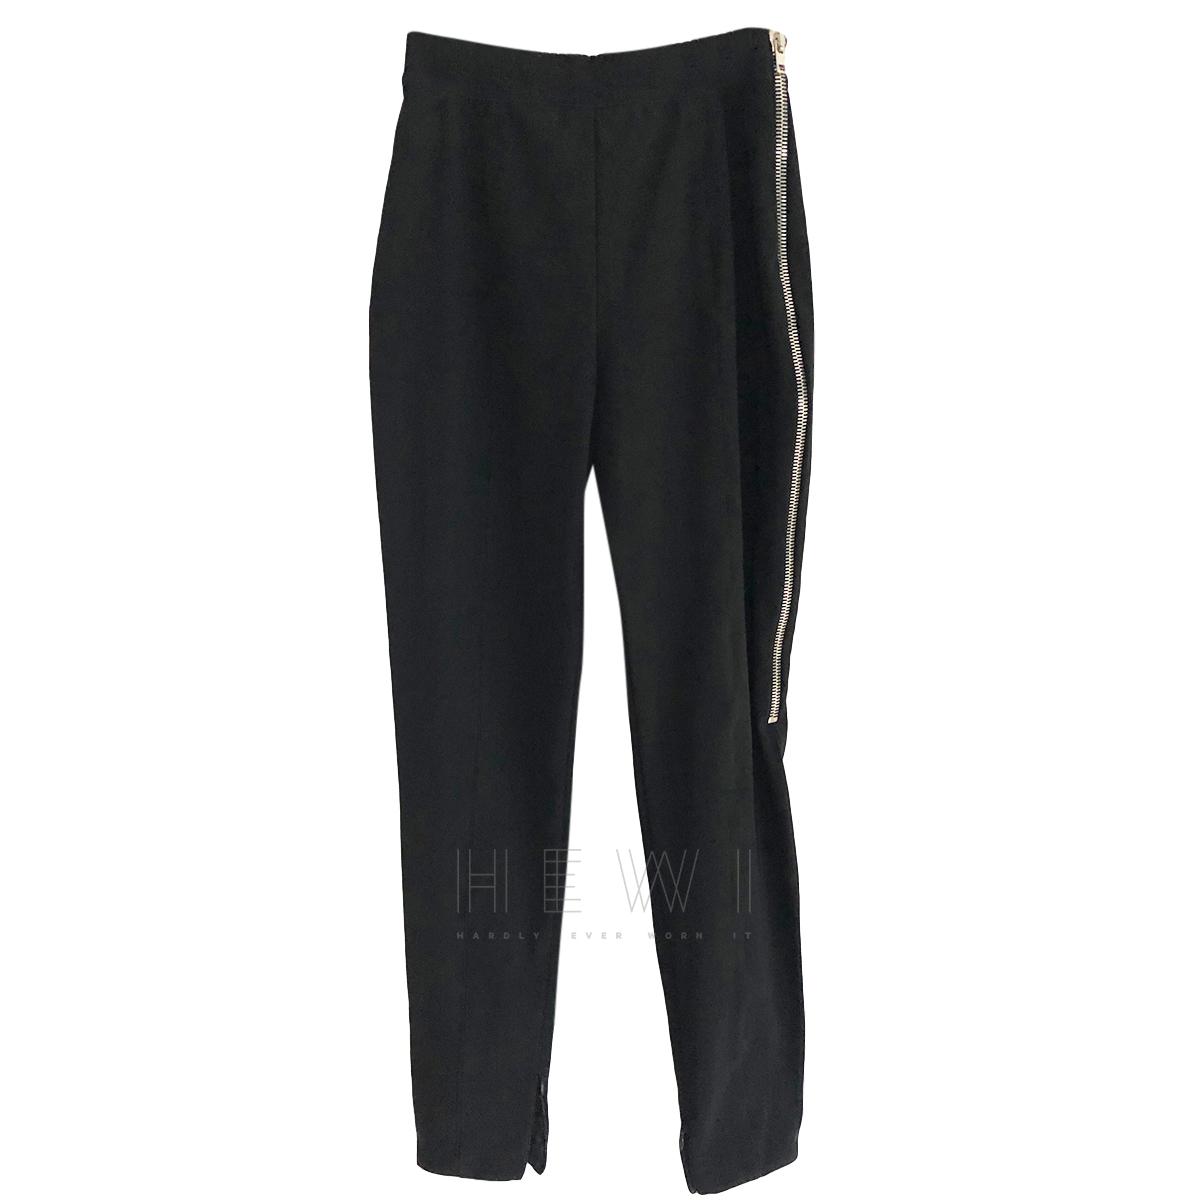 Alexander Wang Side-Zip Trousers